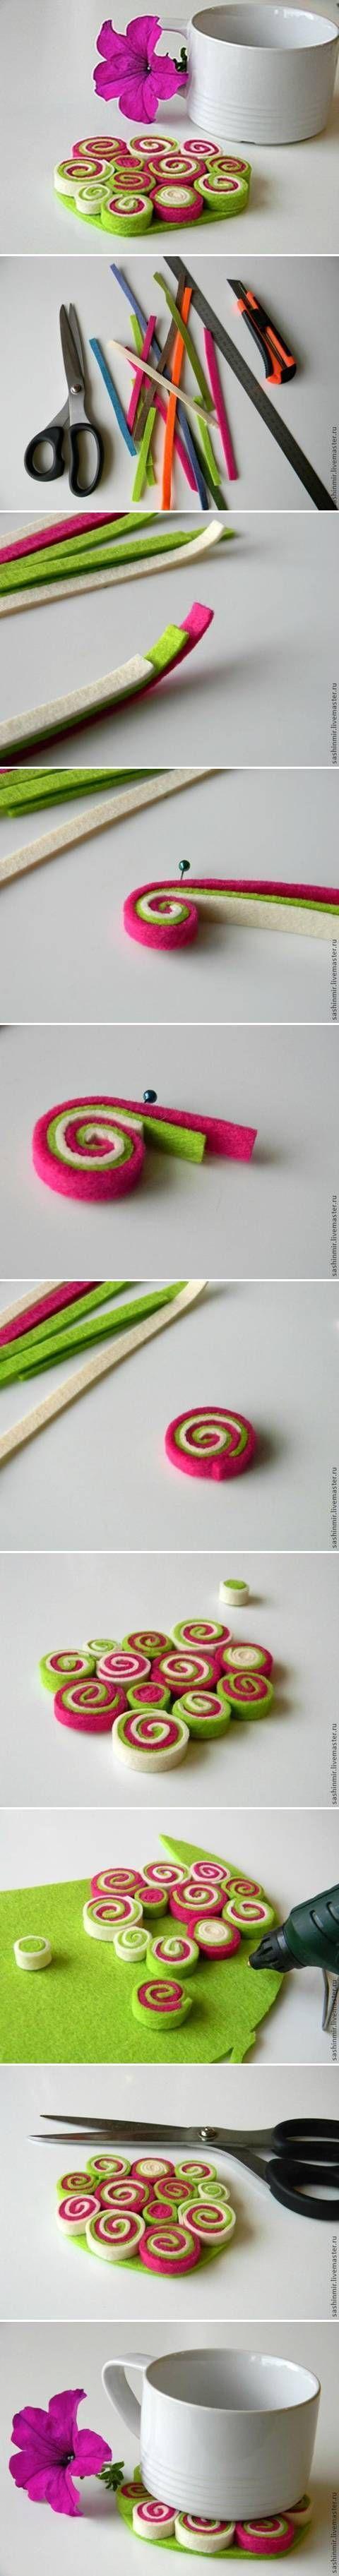 DIY Felt Coaster DIY Projects | UsefulDIY.com